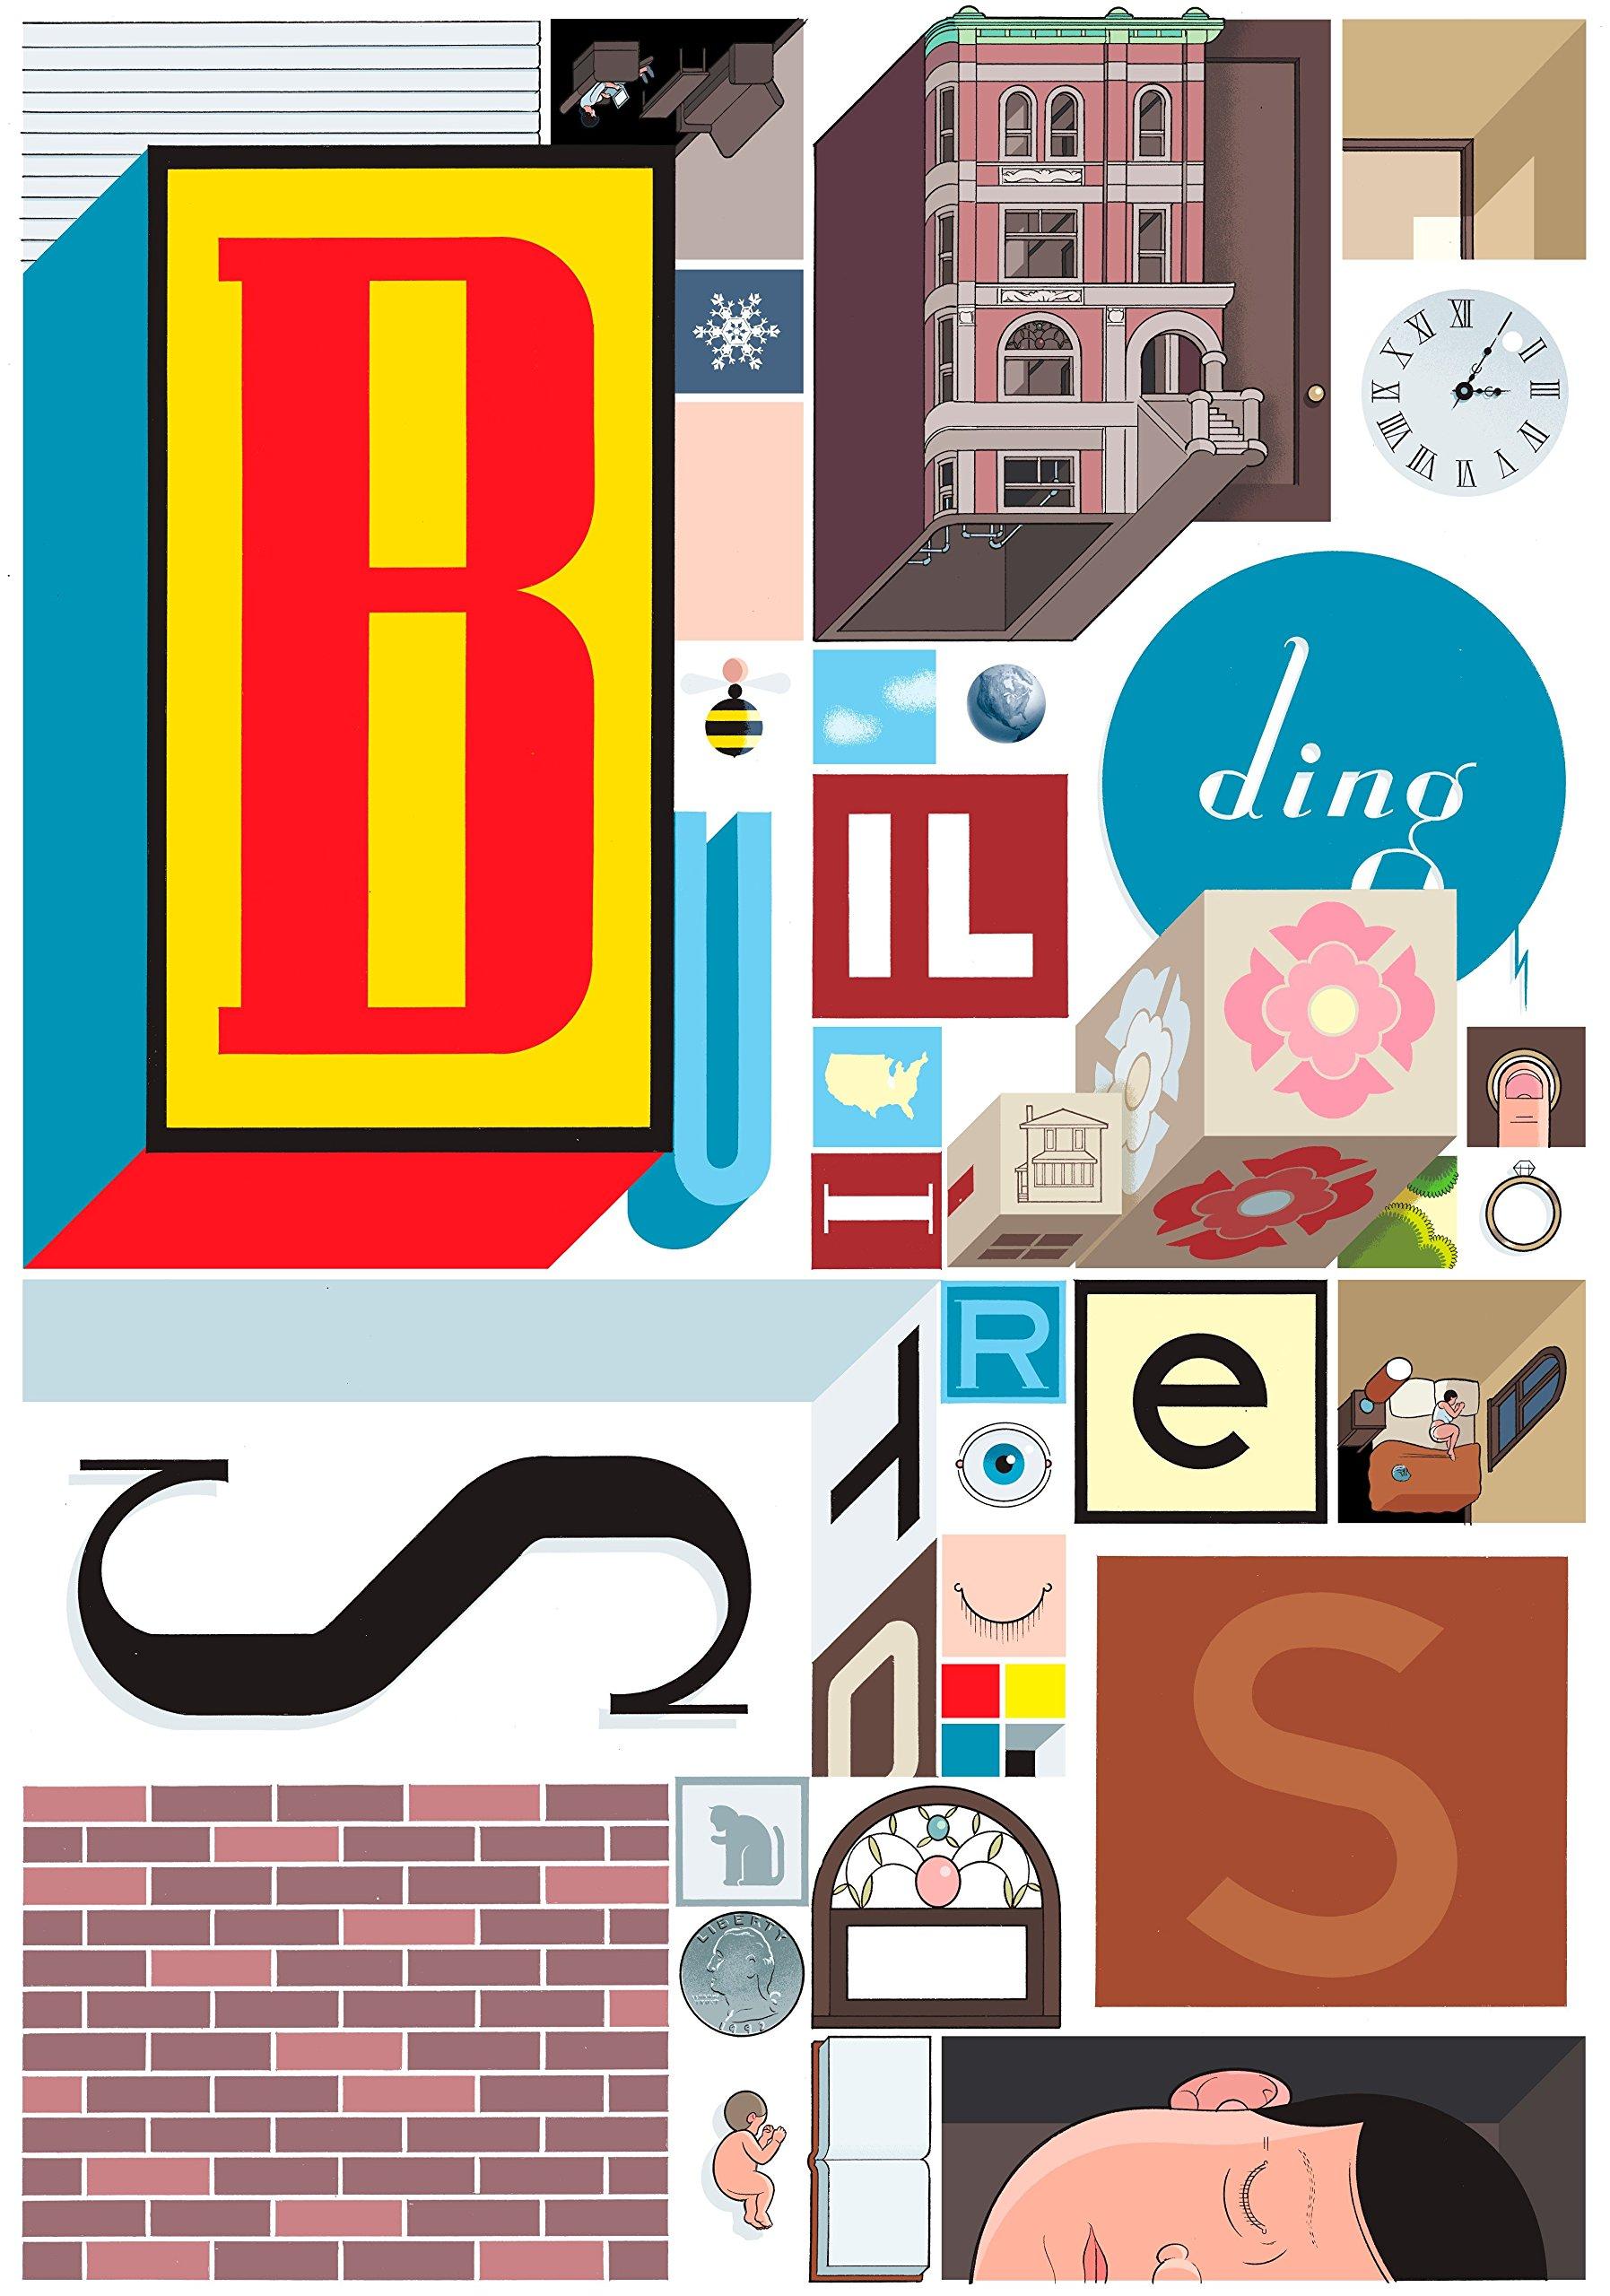 Building stories (2012, Pantheon Books)